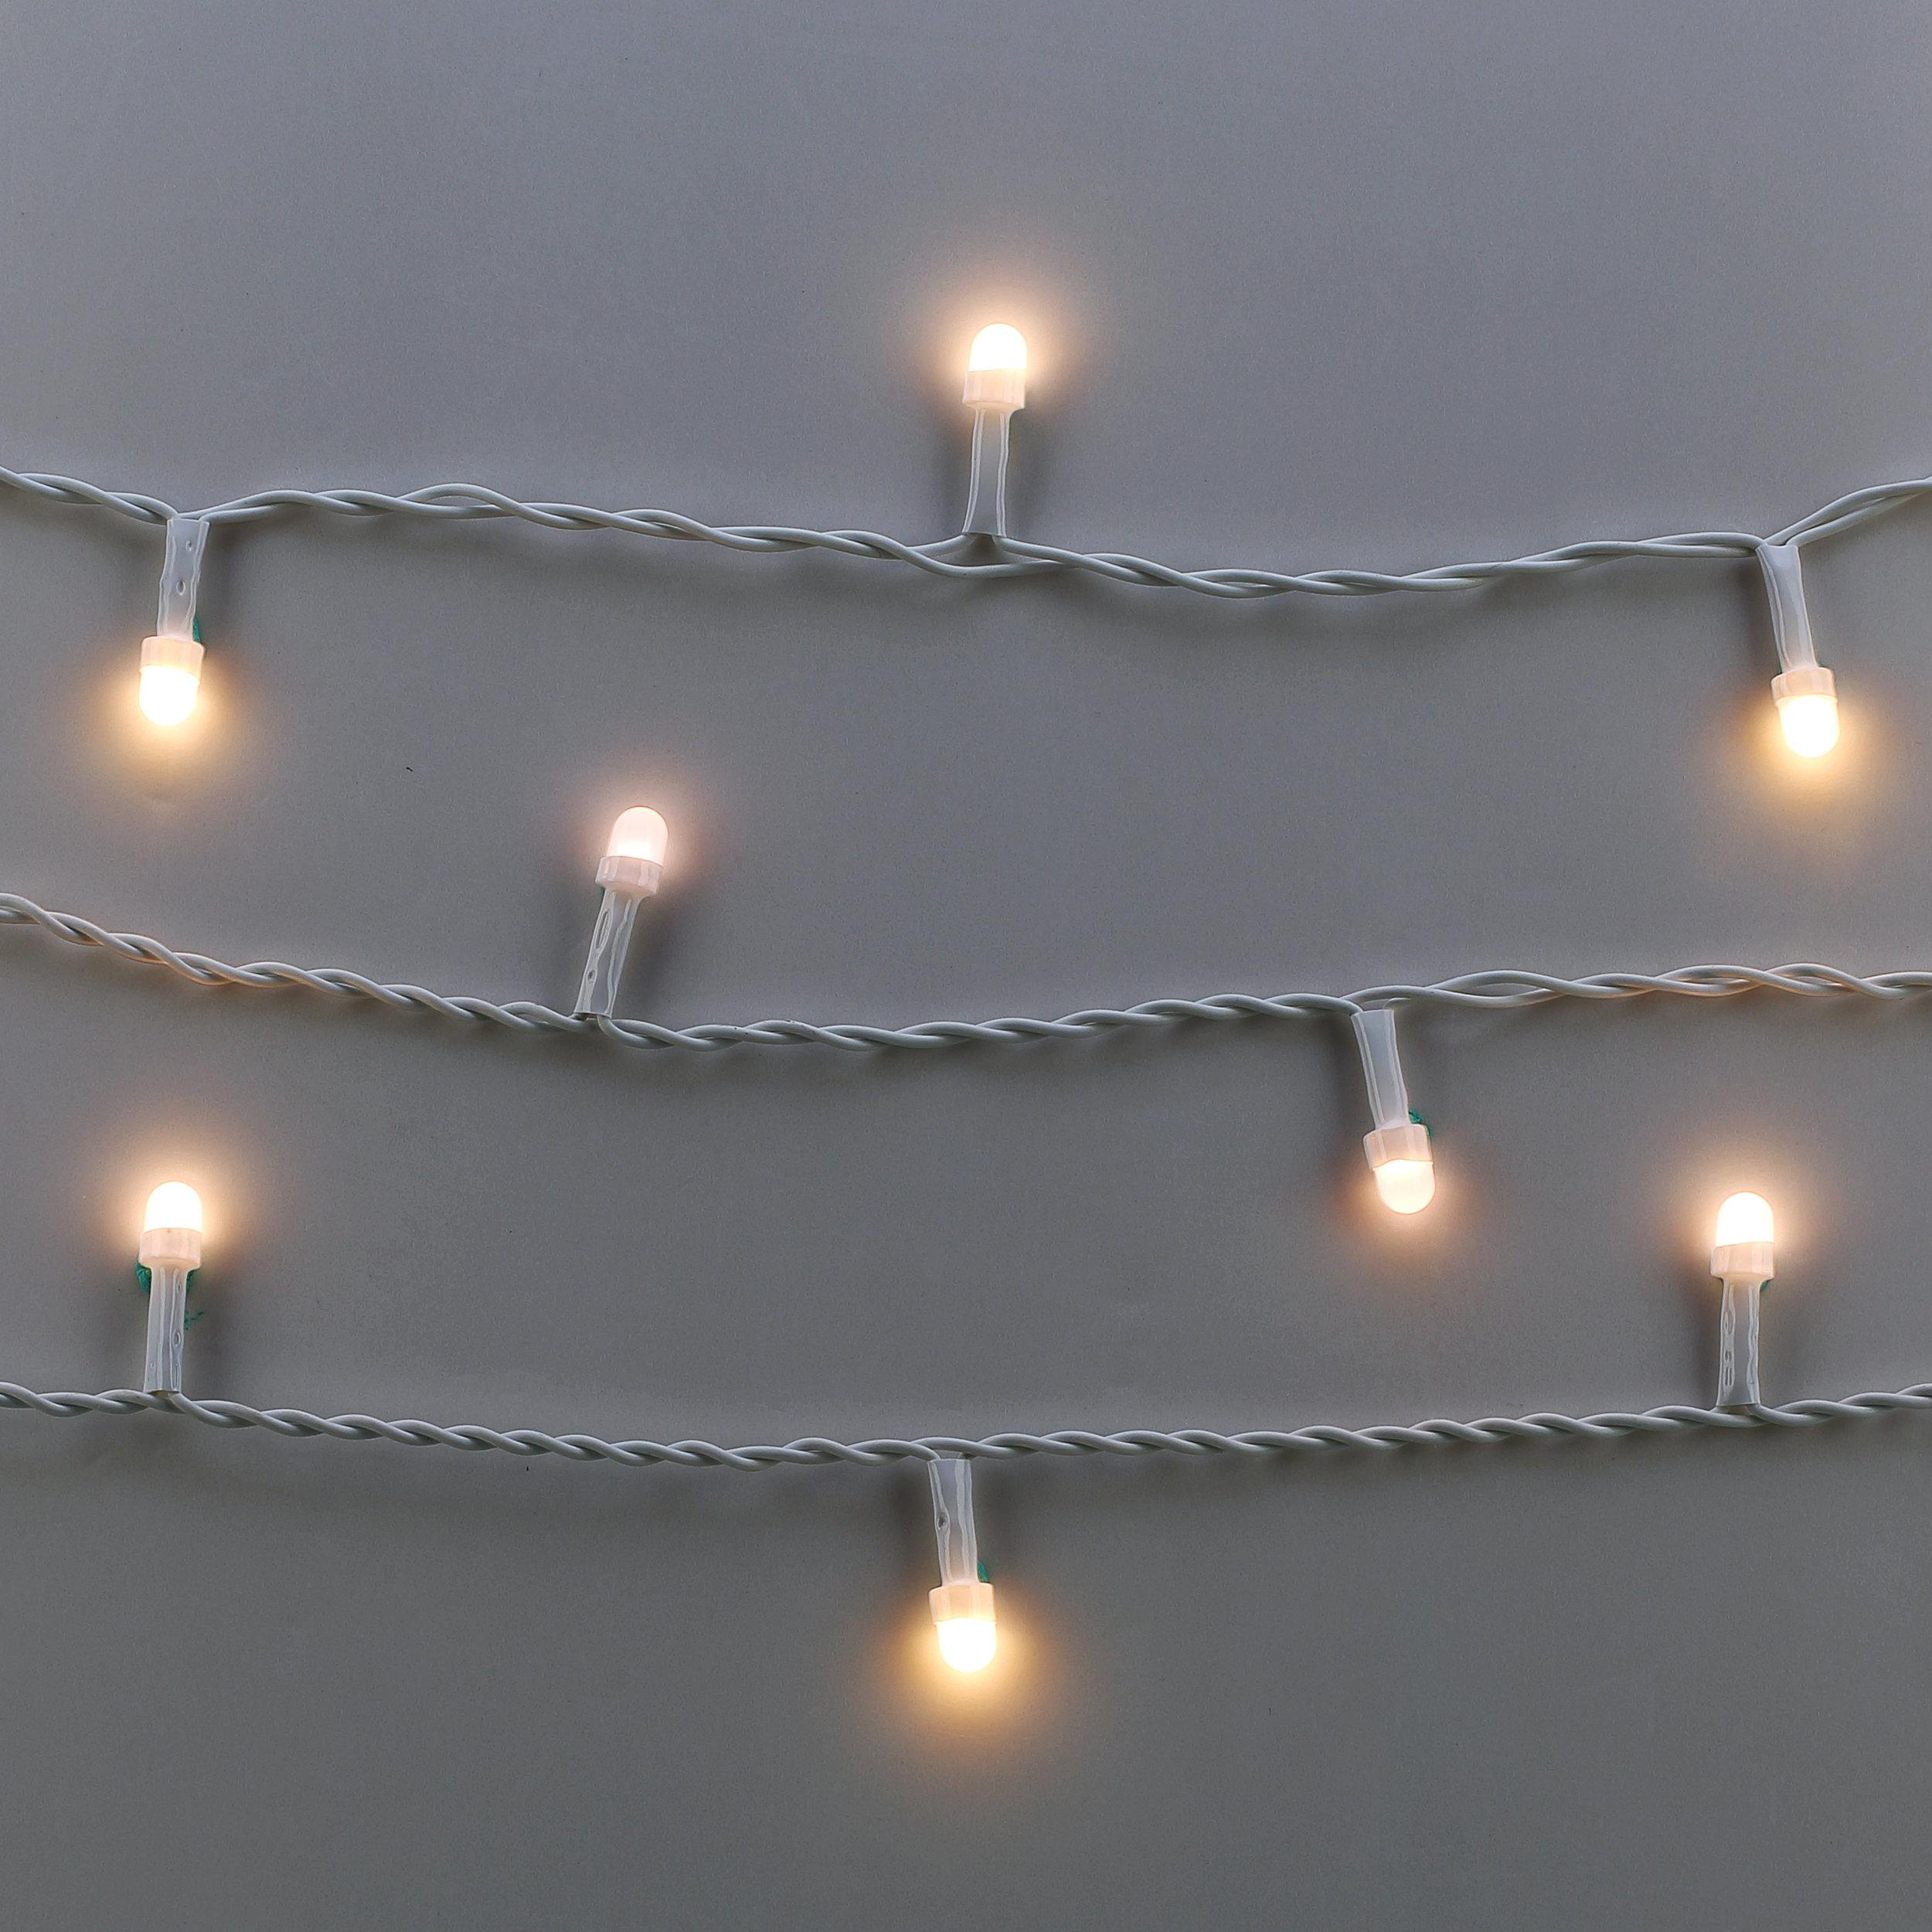 Novolink SL-ICS-200-8-BLE-MC Line of LEDs